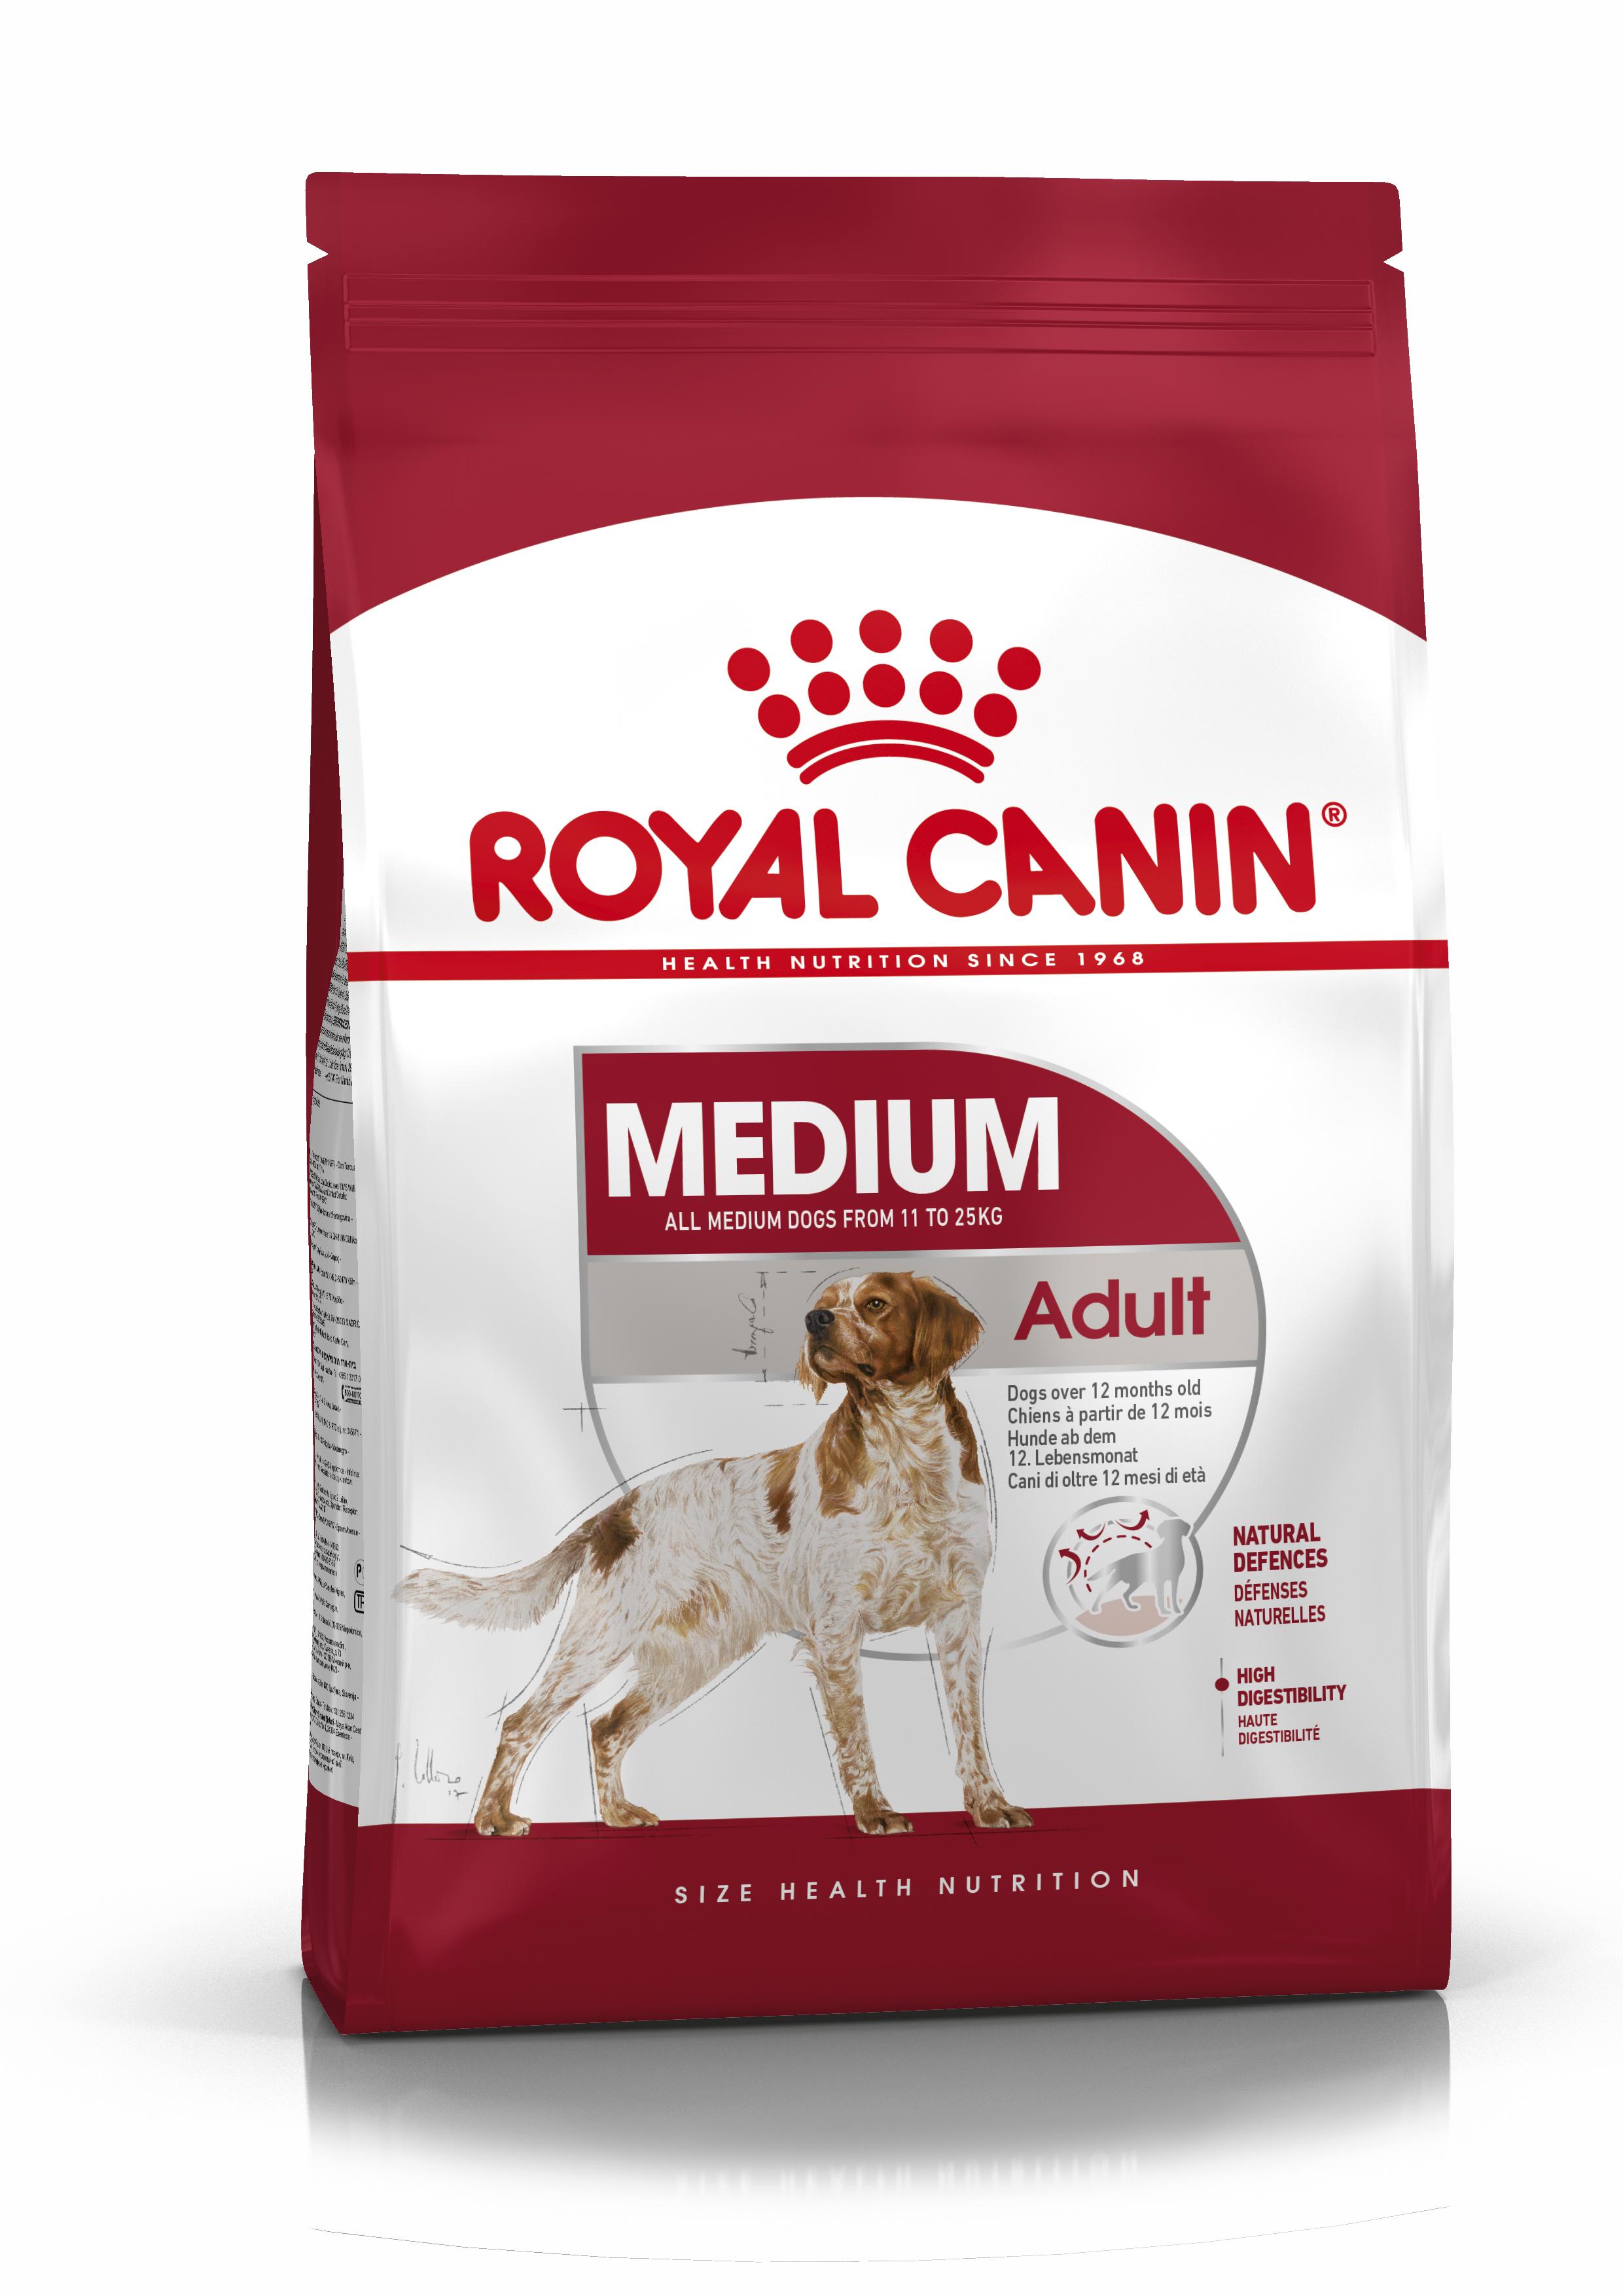 Royal Canin Medium Adult hondenvoer 15 + 3 kg gratis